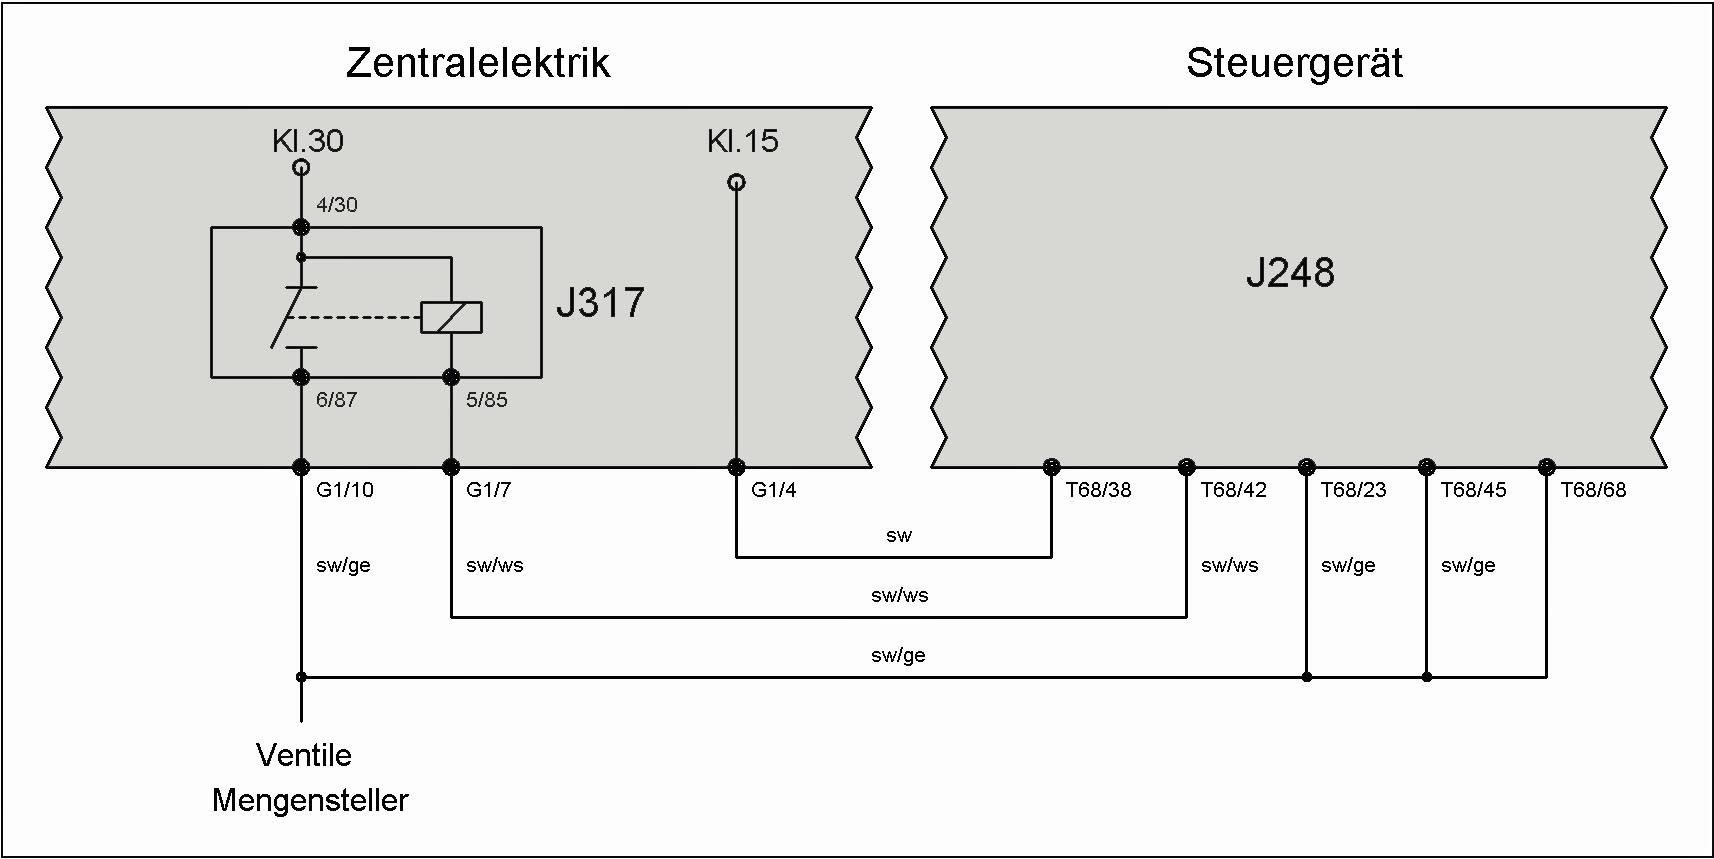 Ungewöhnlich 12v 30a Relais Schaltplan Bilder - Verdrahtungsideen ...